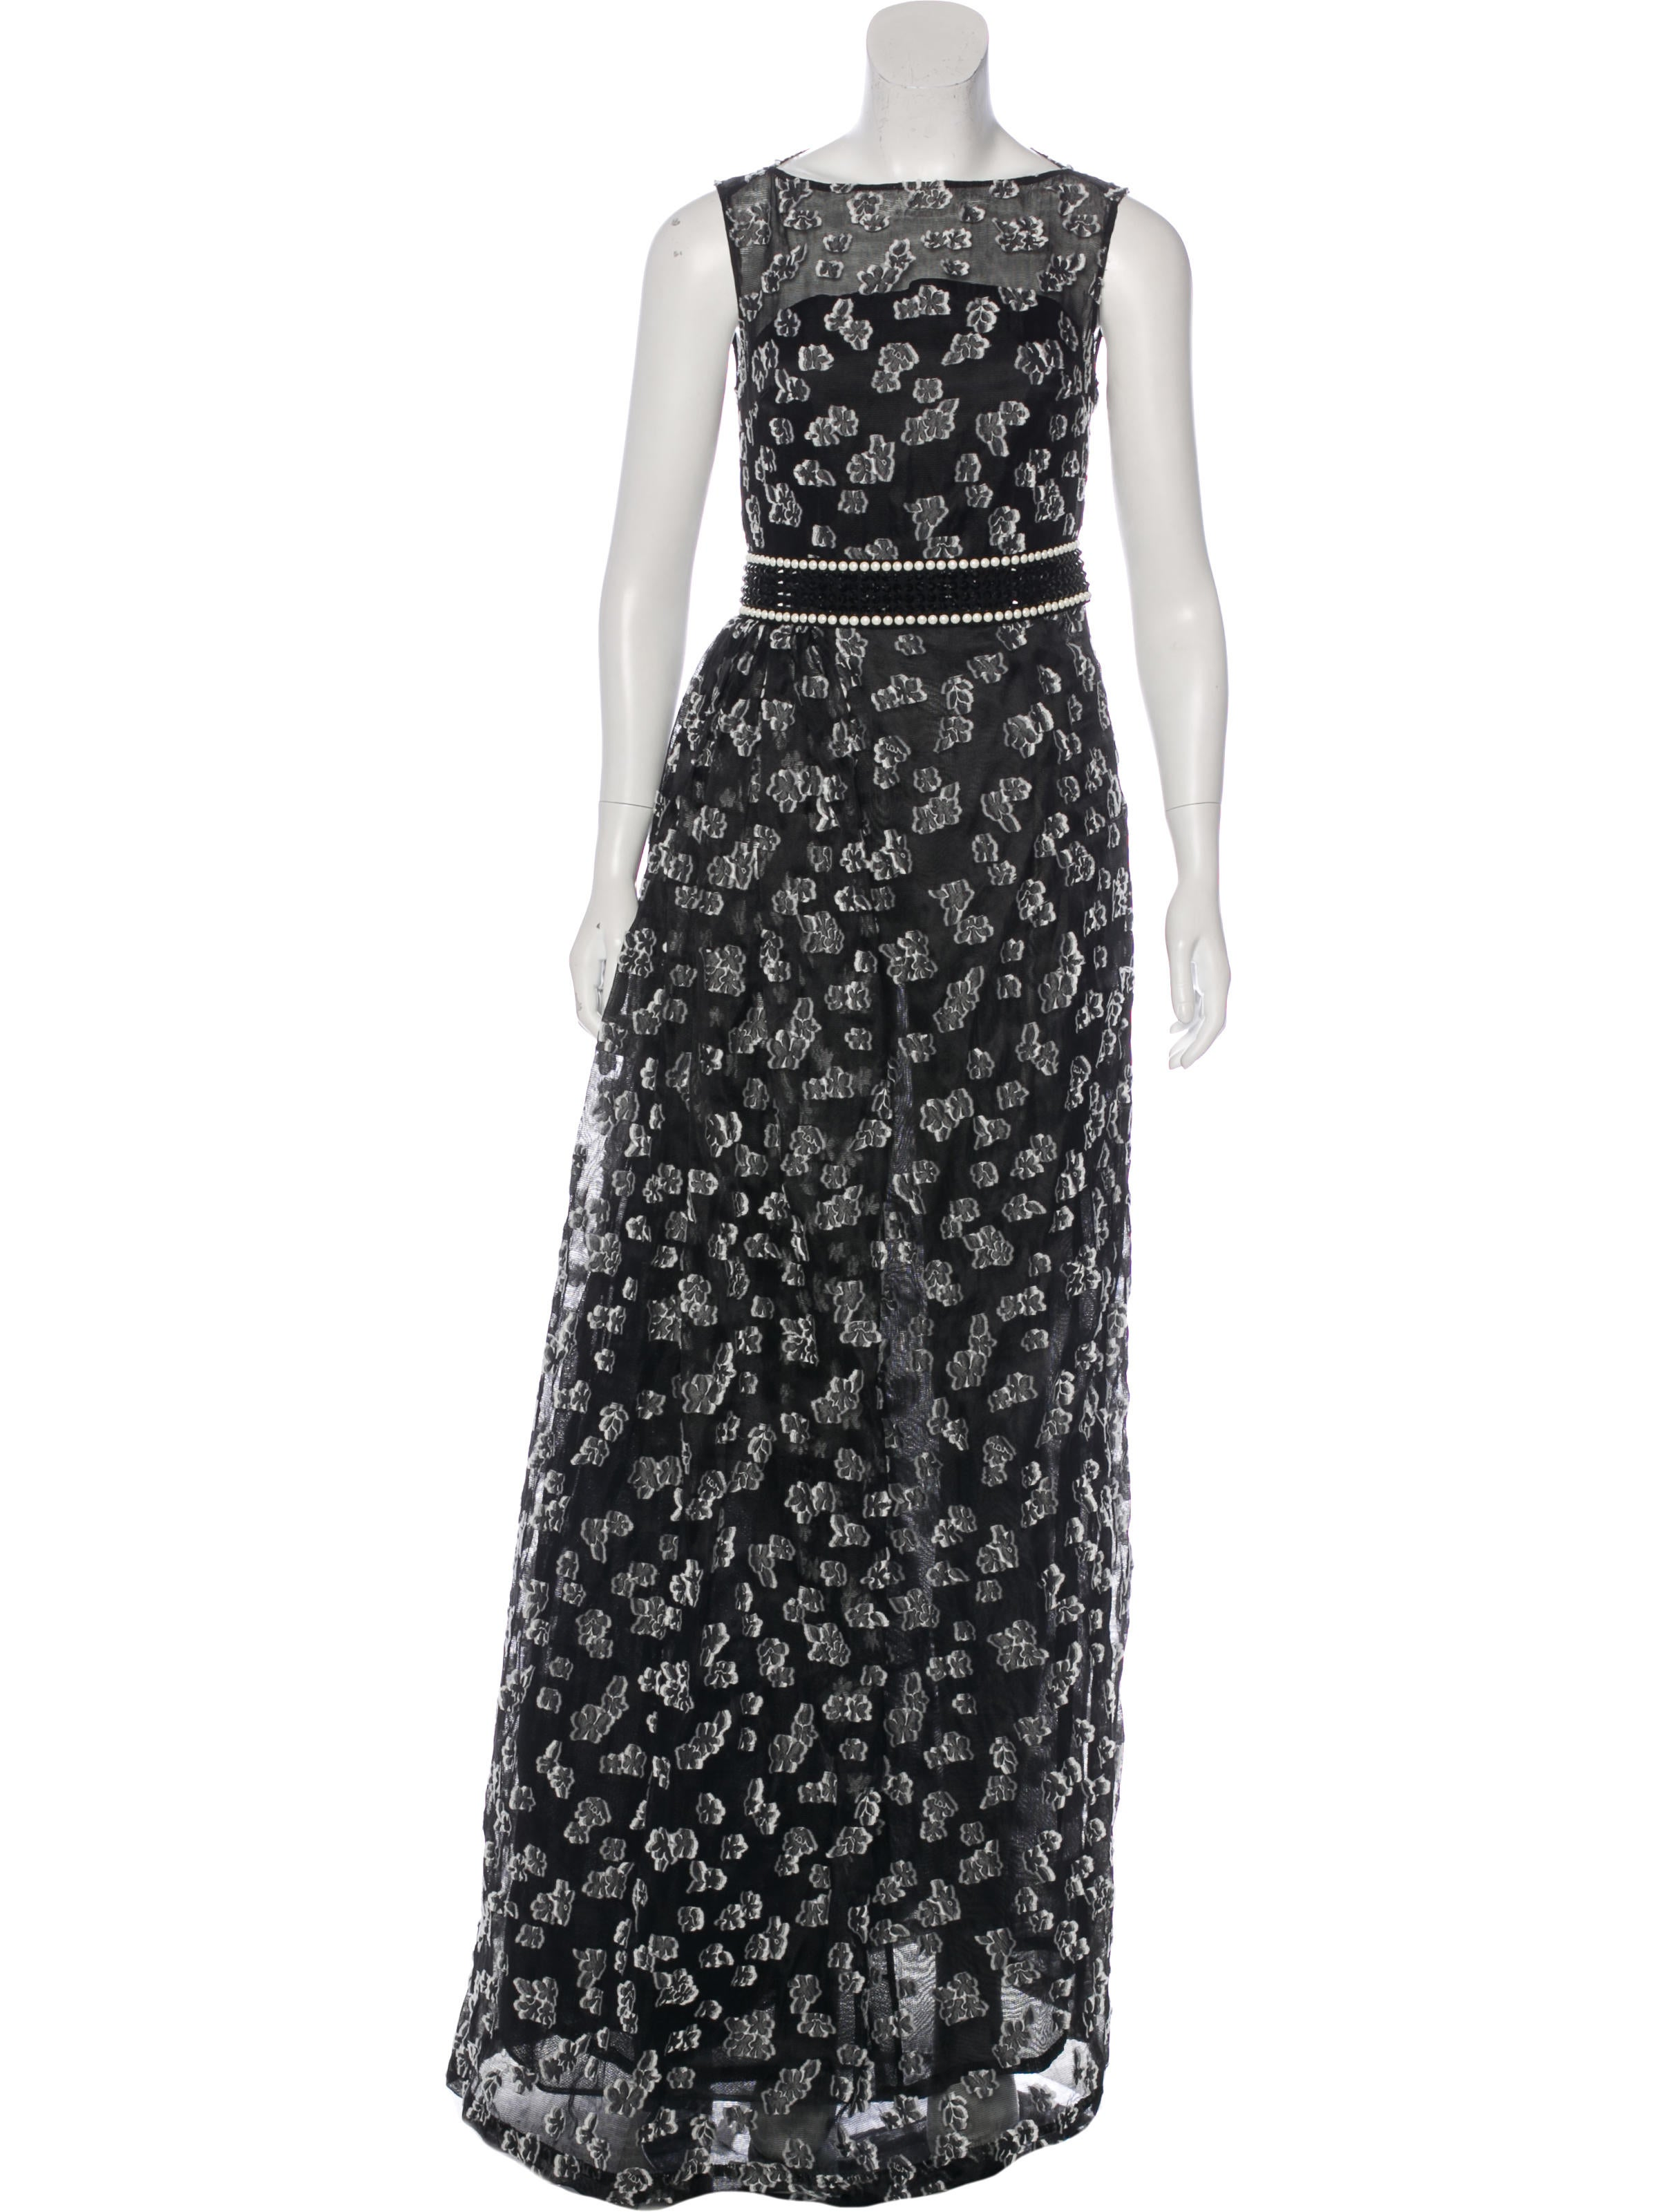 St. John Embellished Evening Dress w/ Tags - Clothing - STJ21385 ...